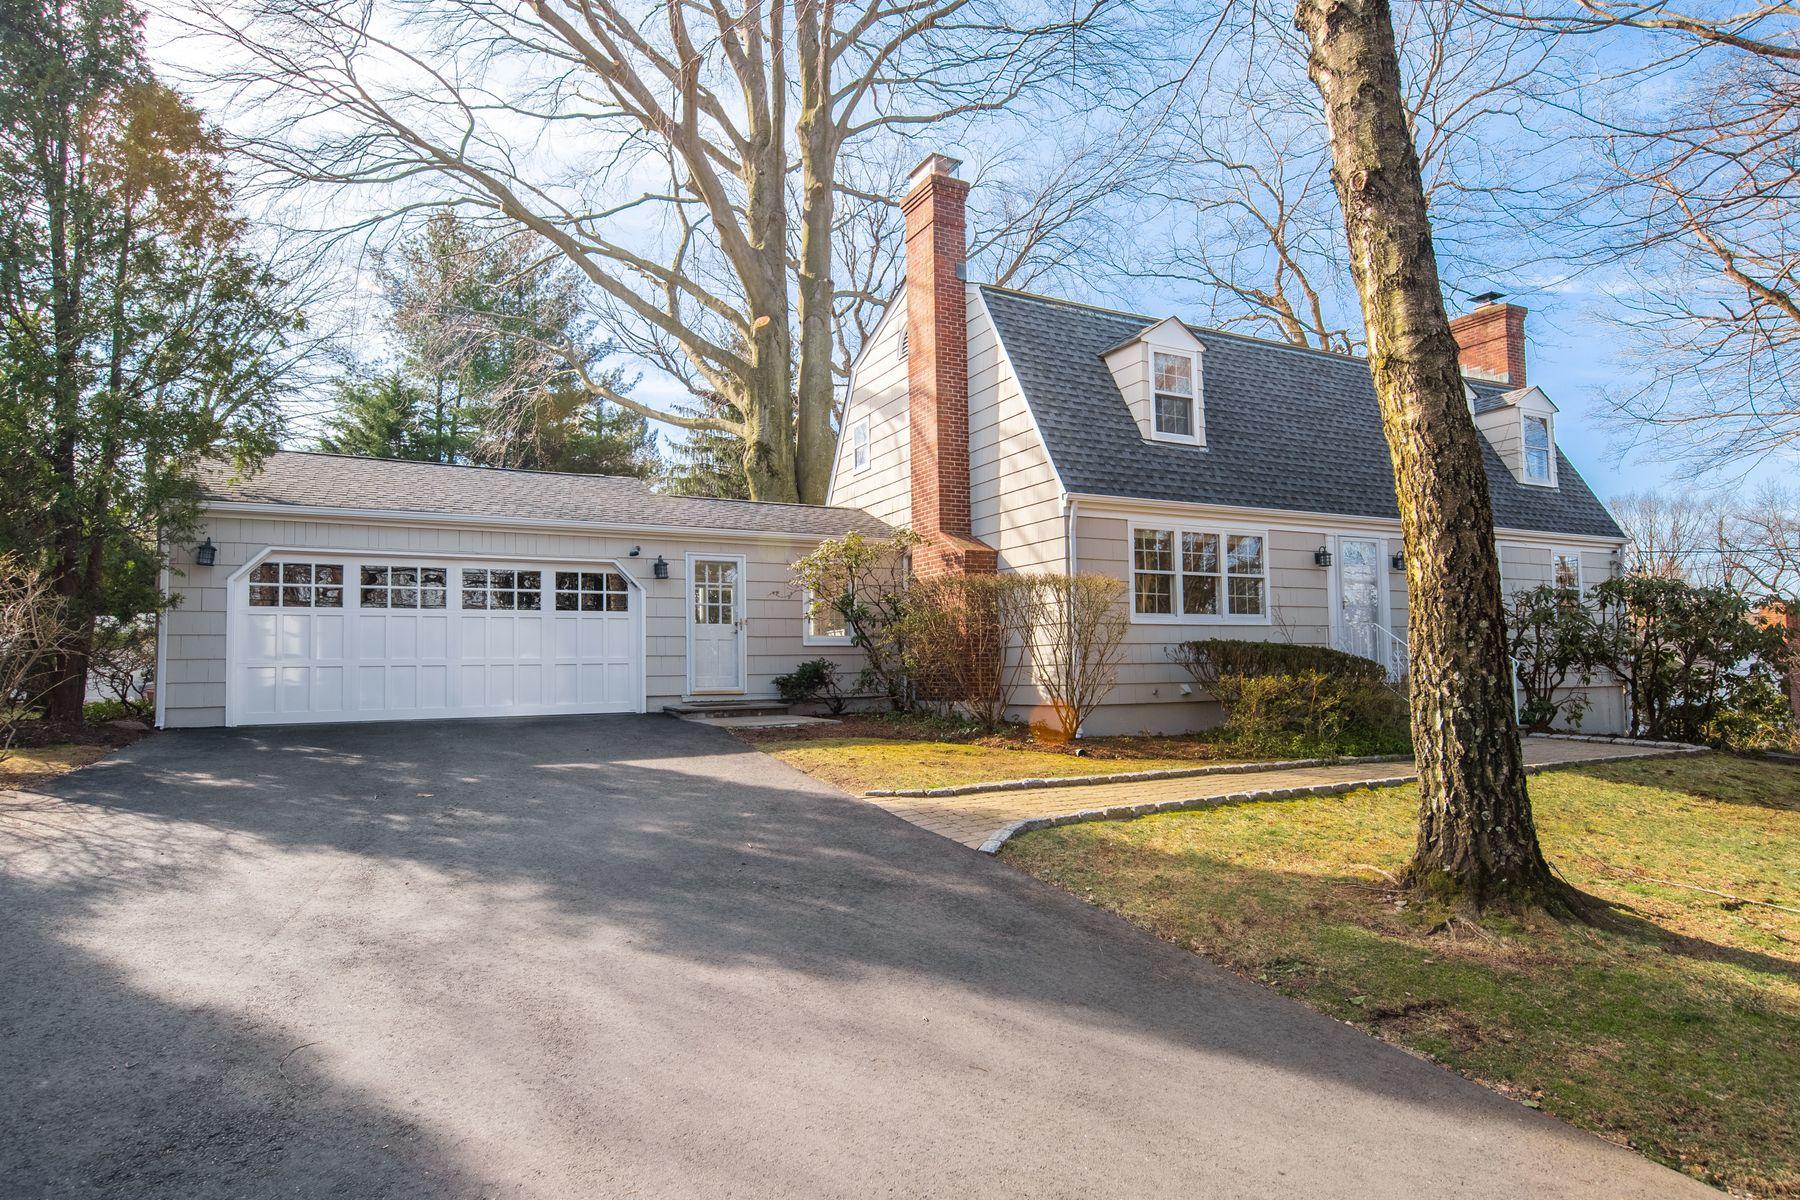 Single Family Homes для того Продажа на Transformed and Updated 240 Palmer Hill Road, Old Greenwich, Коннектикут 06870 Соединенные Штаты